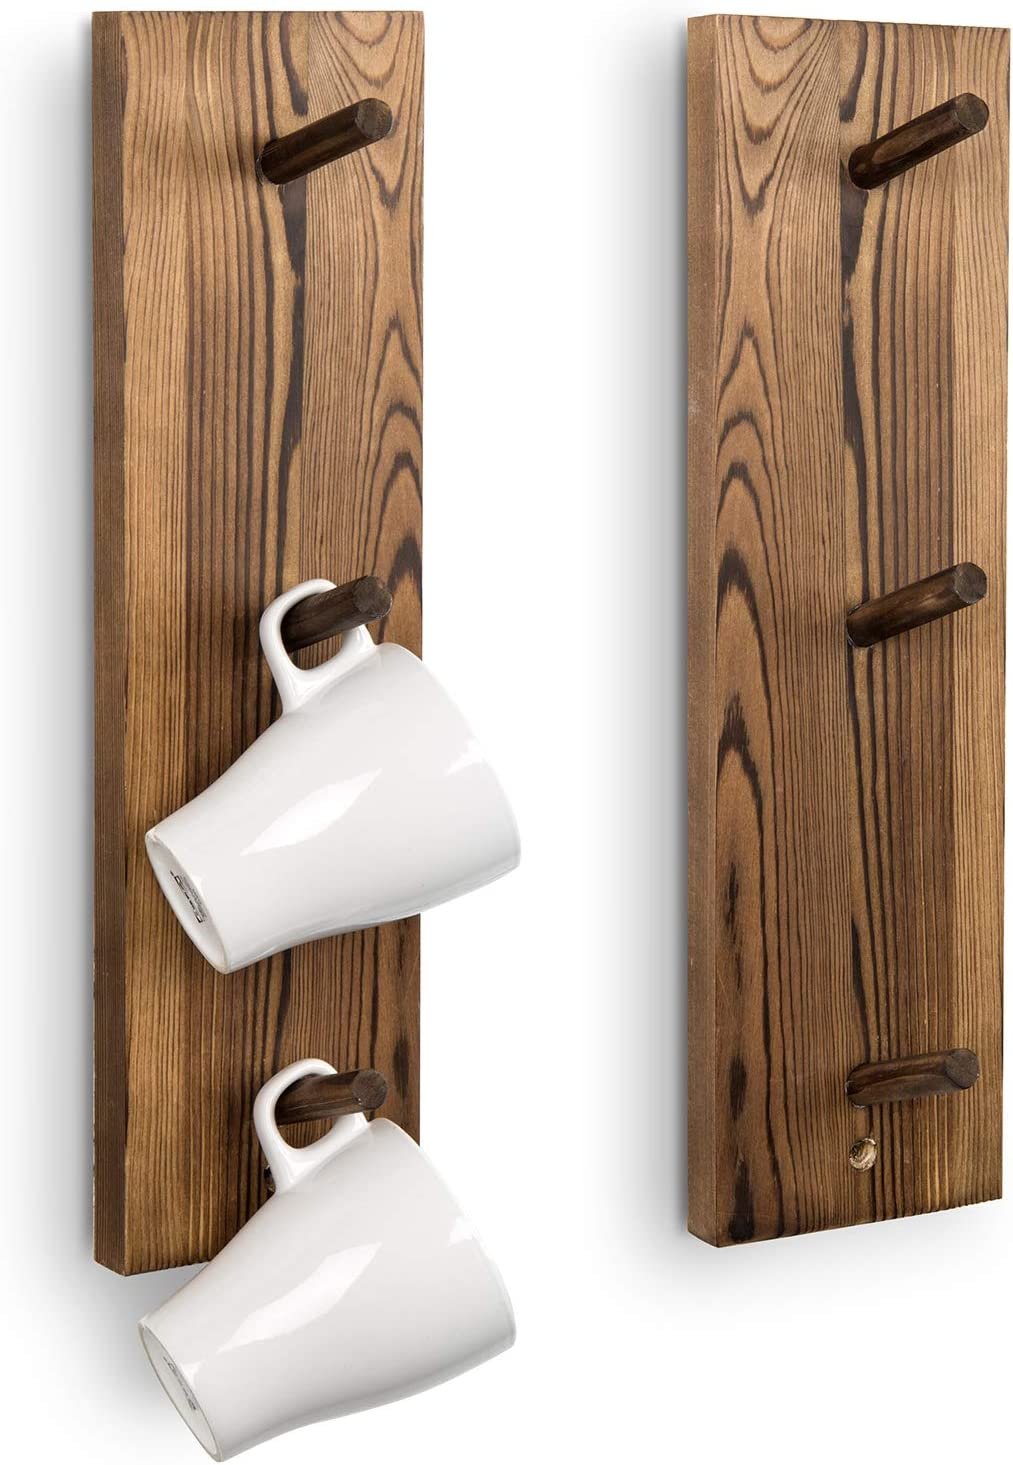 MyGift 3-Hook Wall Mounted Rustic Burnt S Hanging Mug Nippon regular agency Wood Popular standard Solid